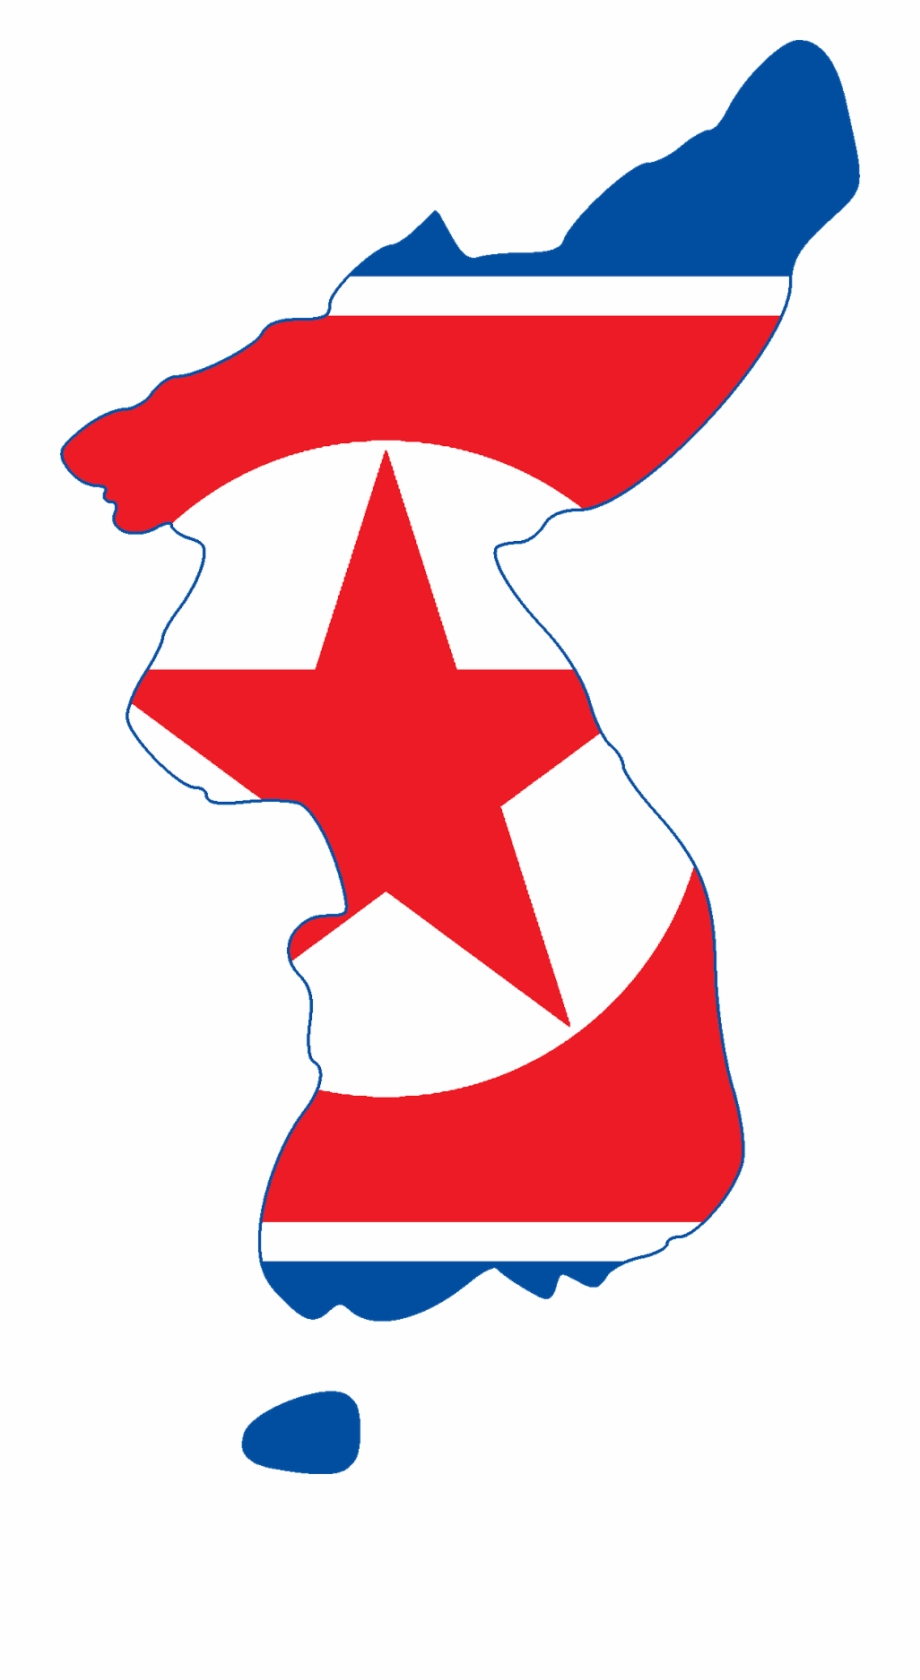 North Korea Flag With Map Graphics.